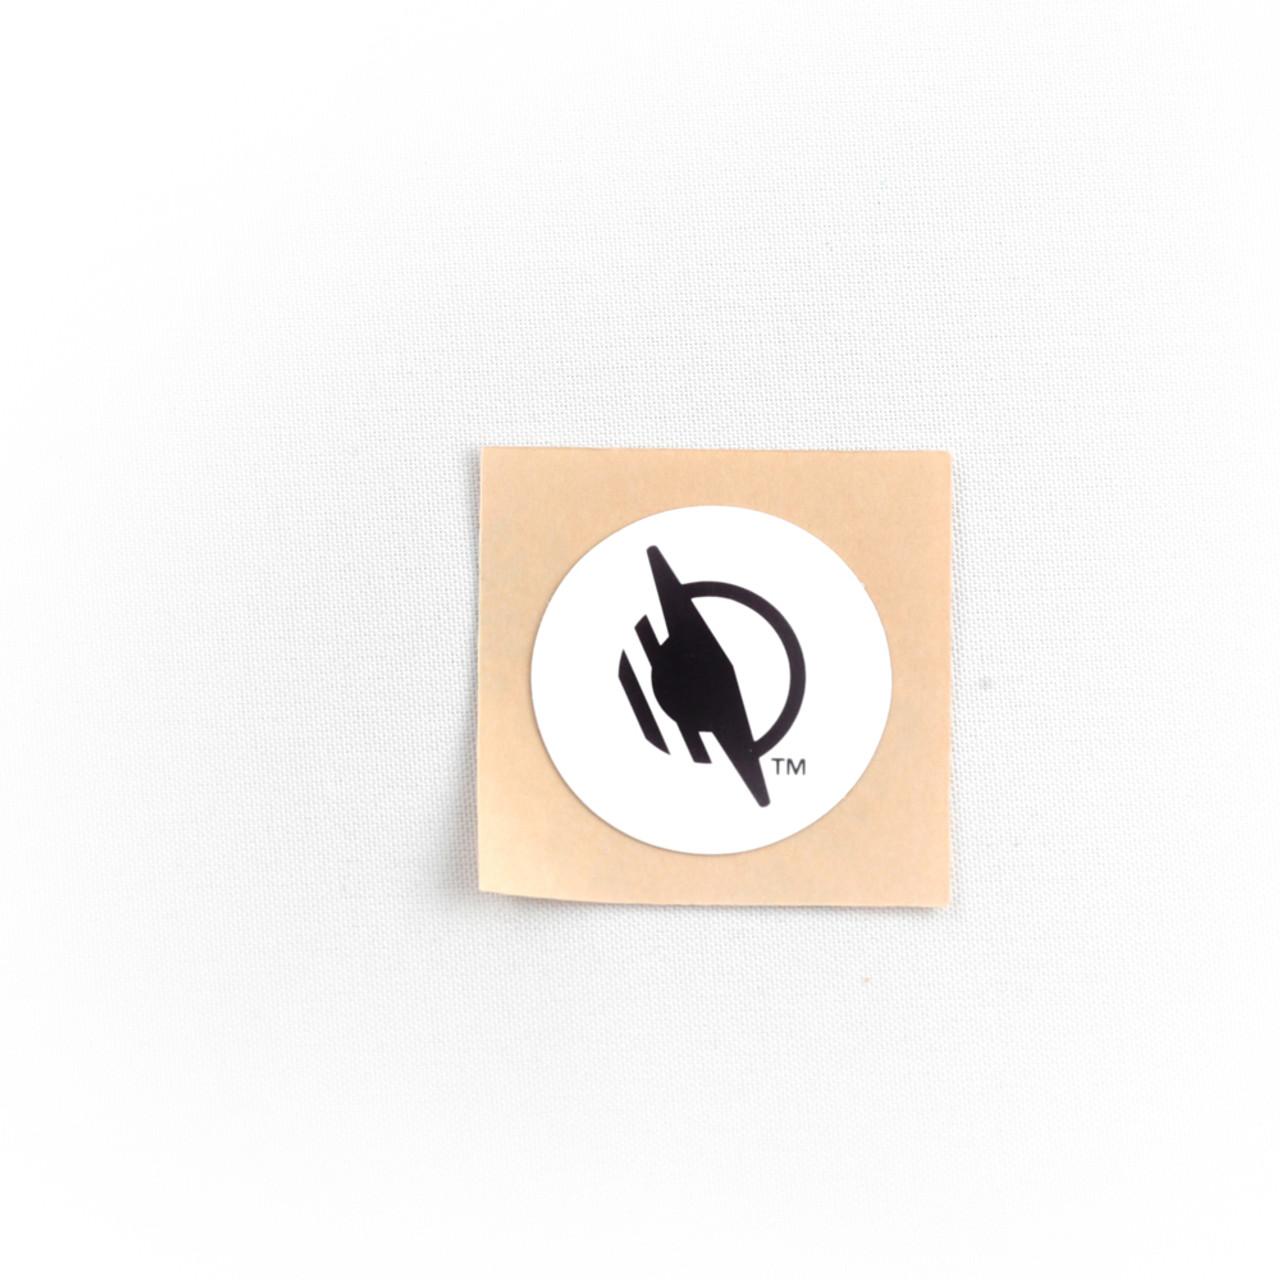 WayTag Stickers - 25 Pack